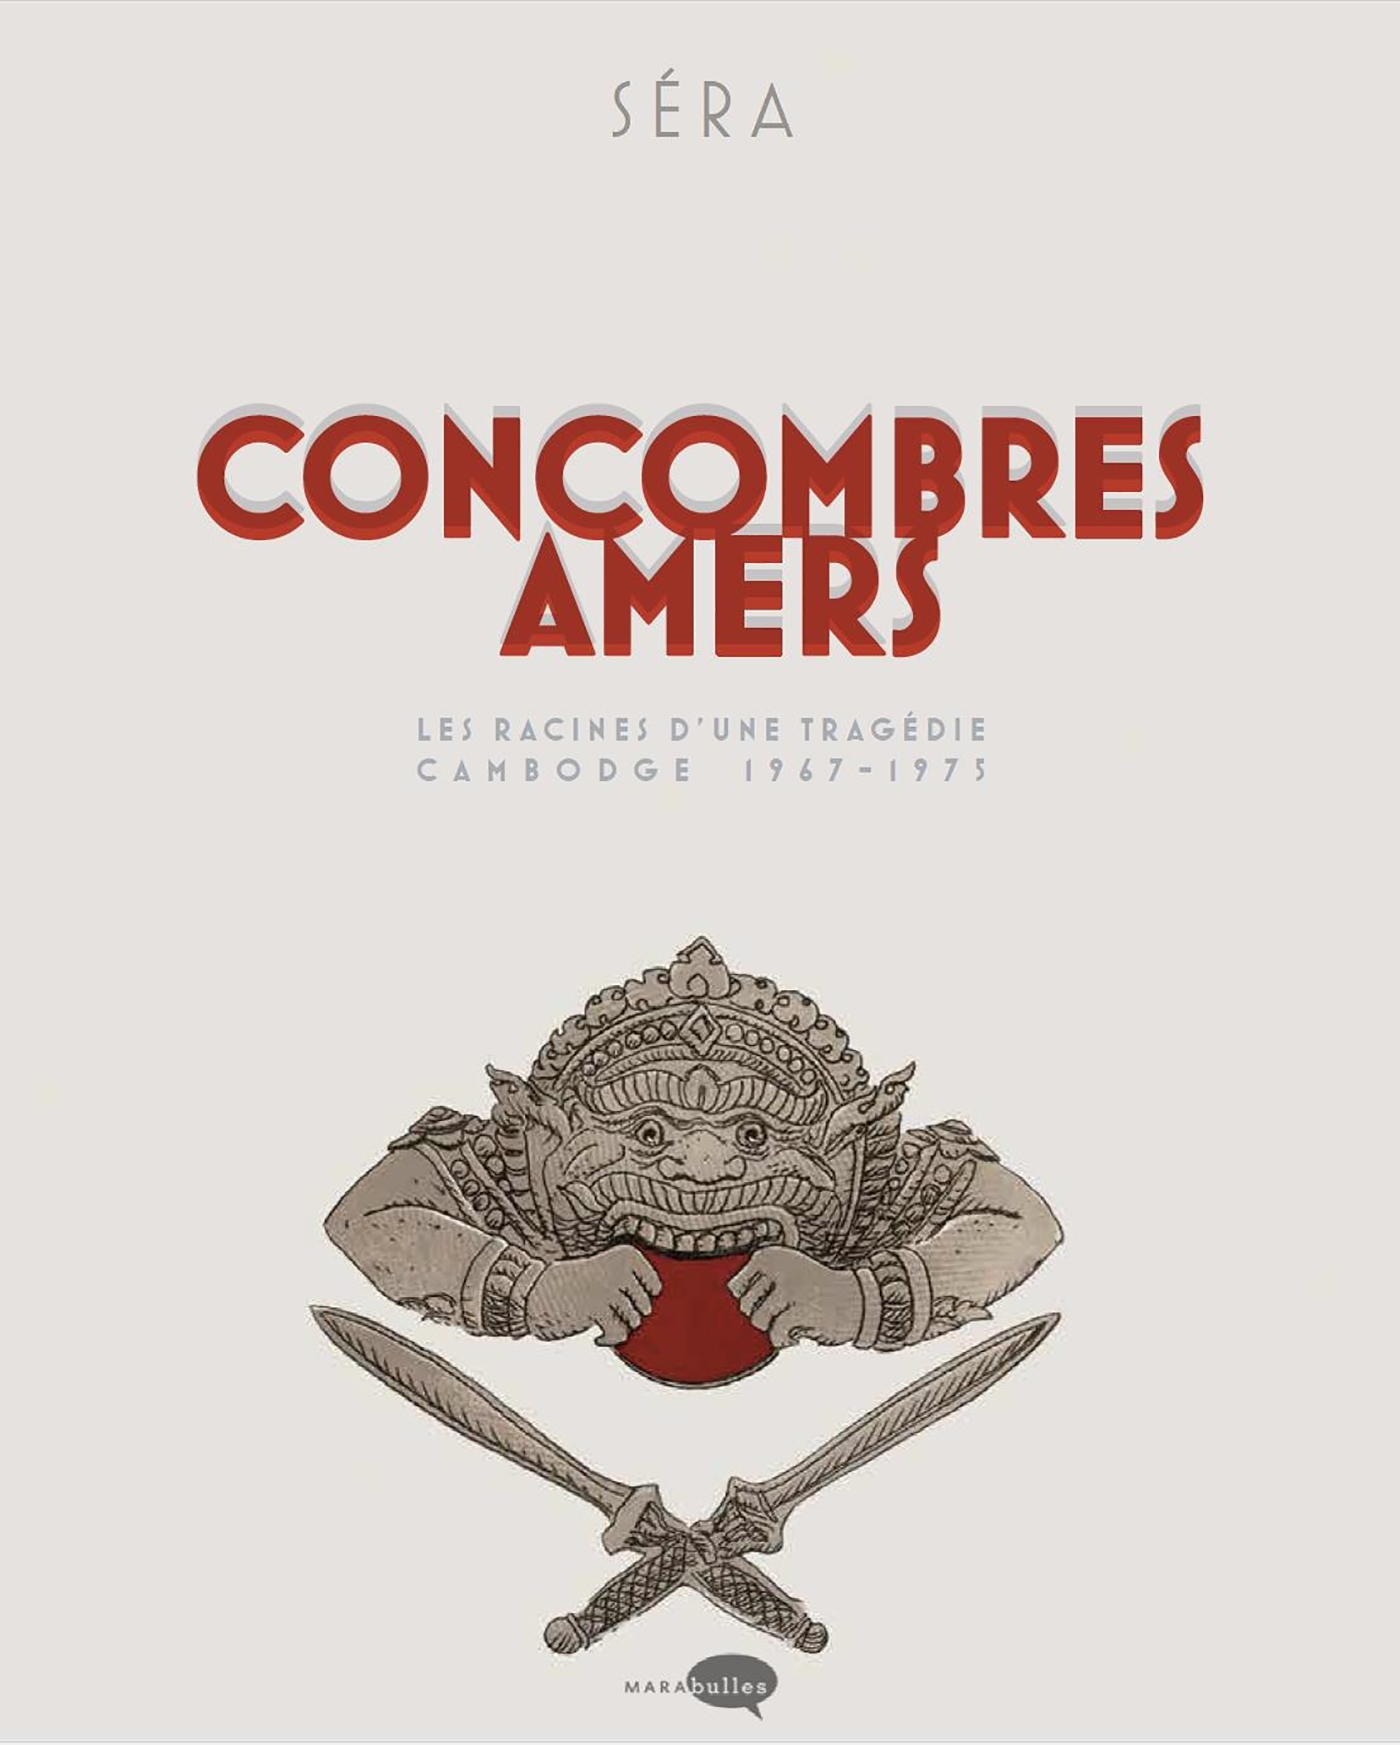 CONCOMBRES AMERS - LES RACINES D UNE TRAGEDIE : CAMBODGE 1967 - 1975